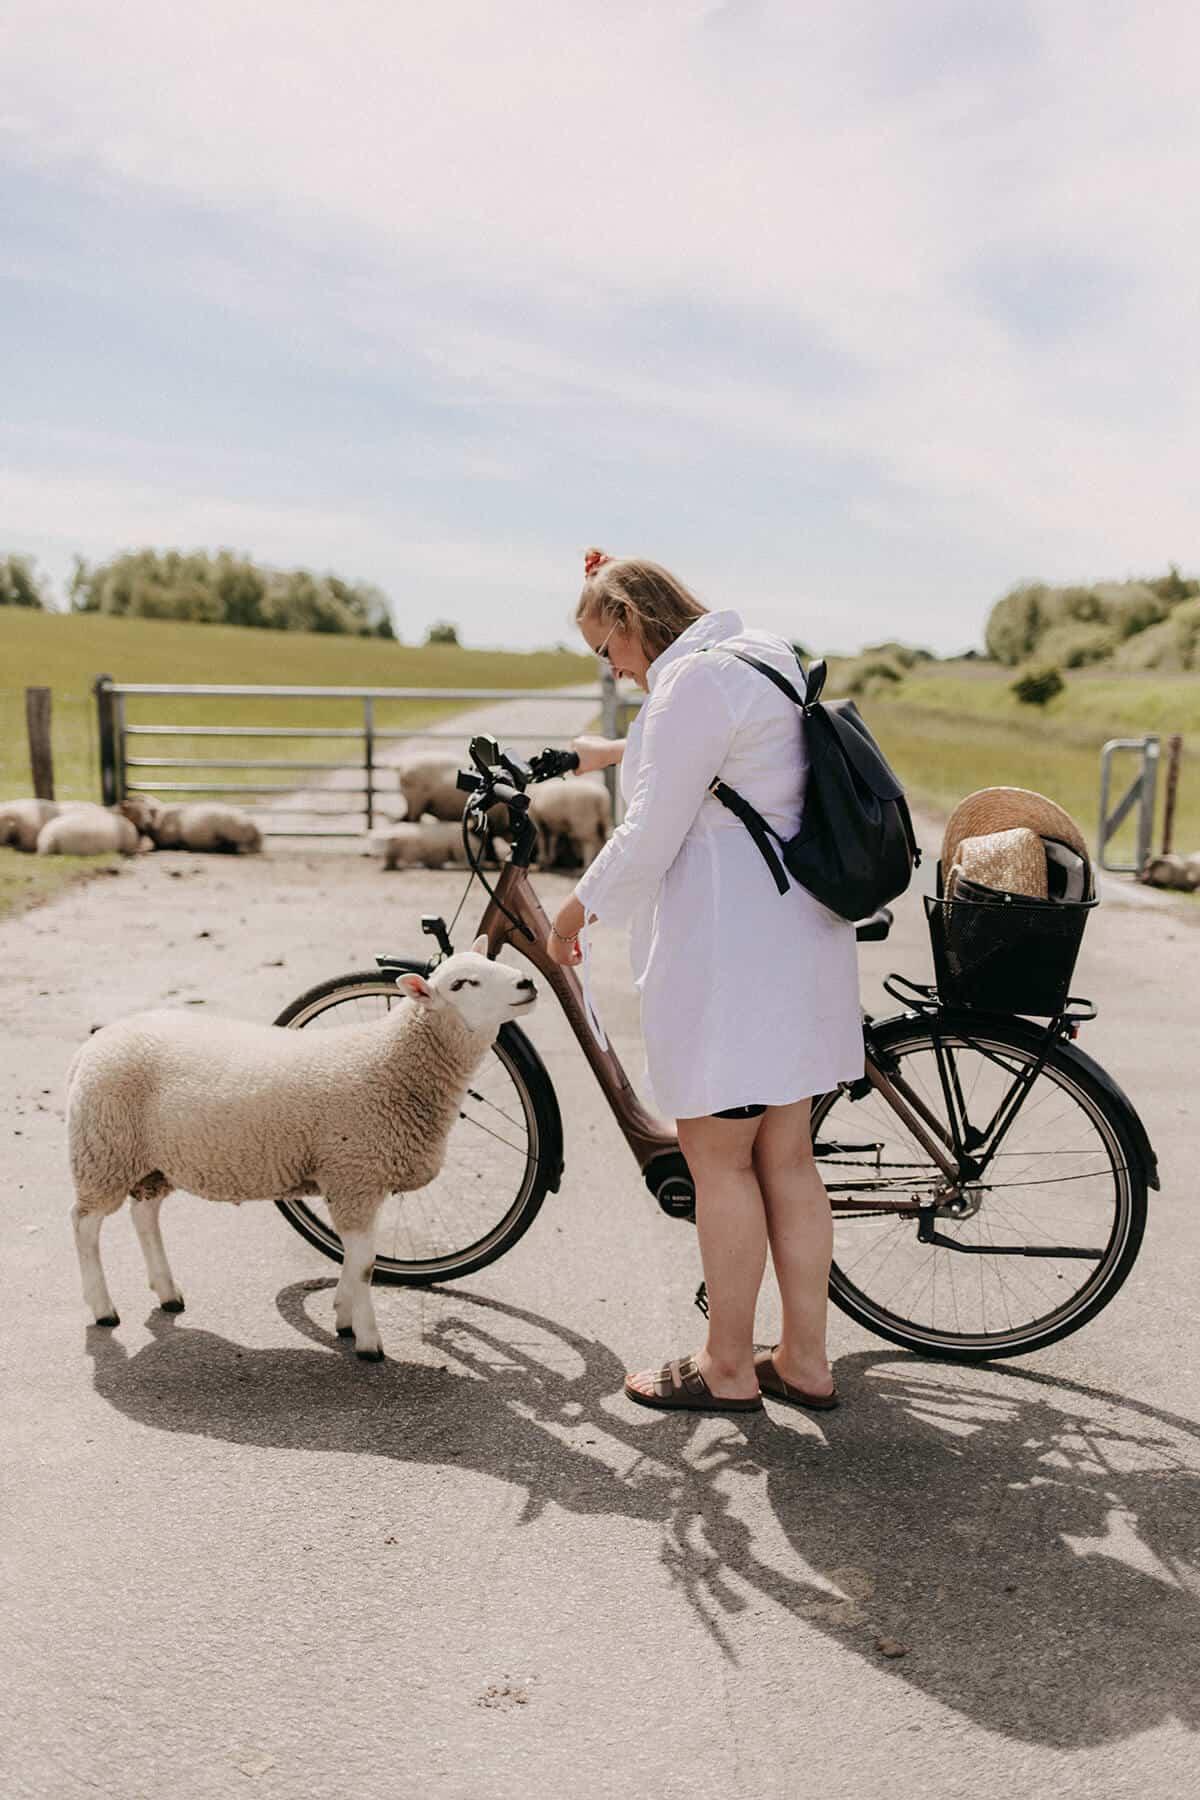 Frau streichelt Schaf